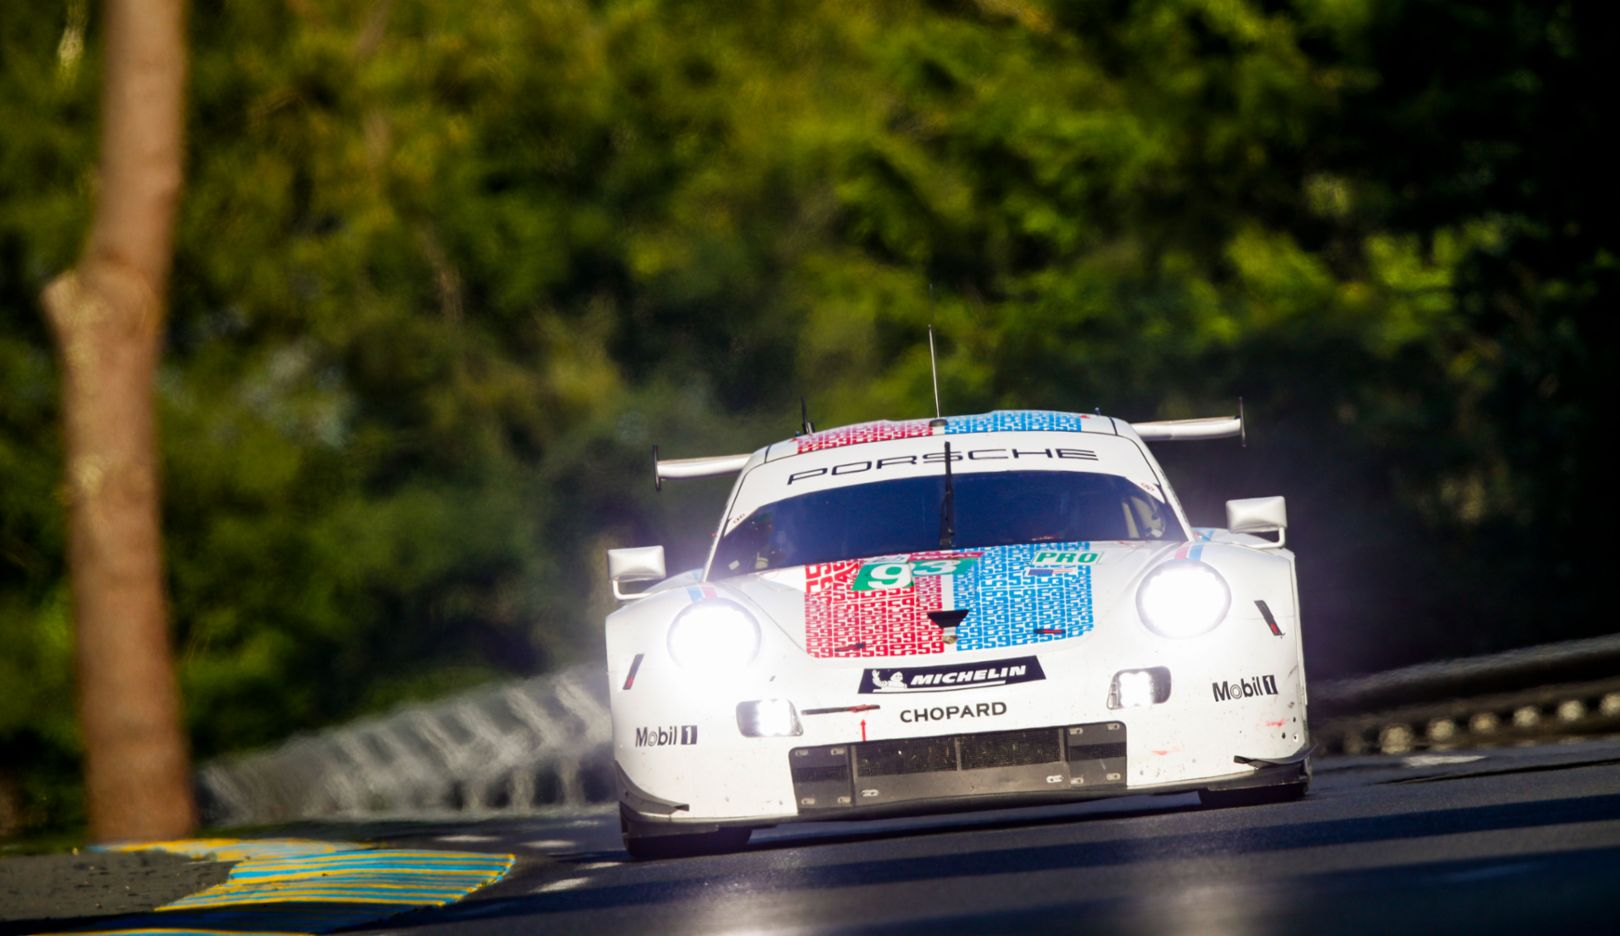 911 RSR, Porsche GT Team (93), Qualifying GTE, FIA WEC, Le Mans, 2019, Porsche AG